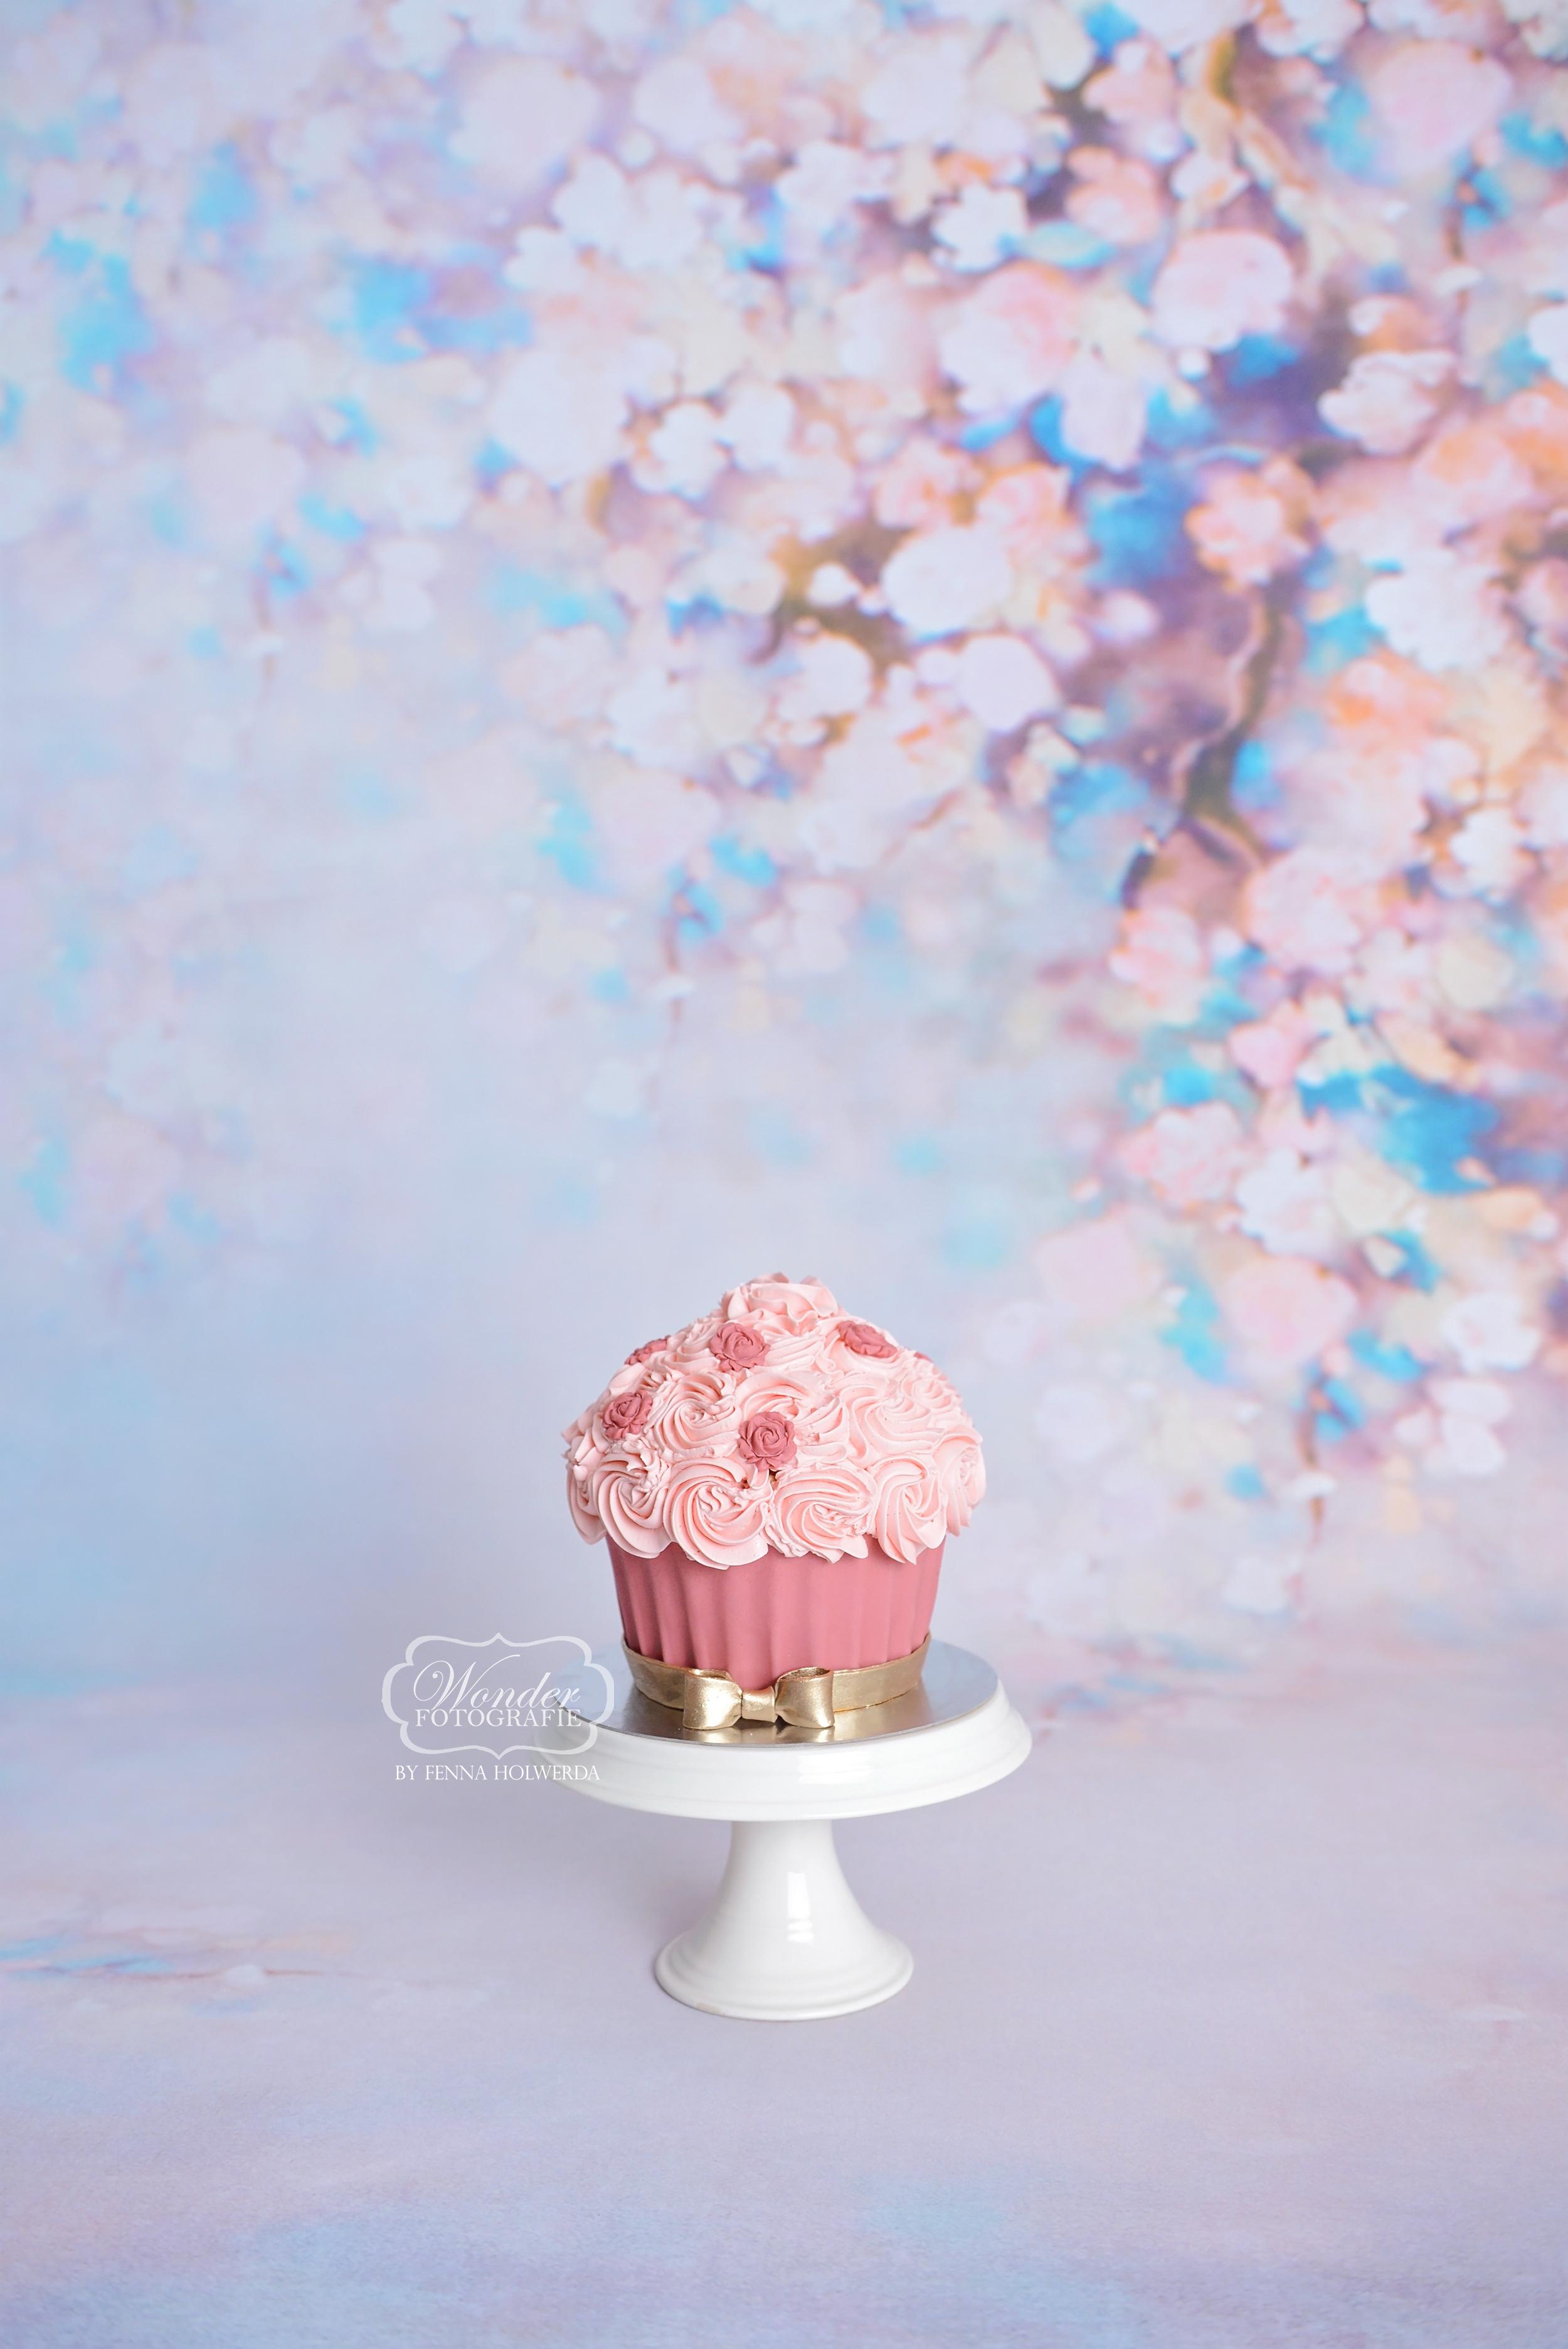 bloemen vintage floral bloesem cake smas